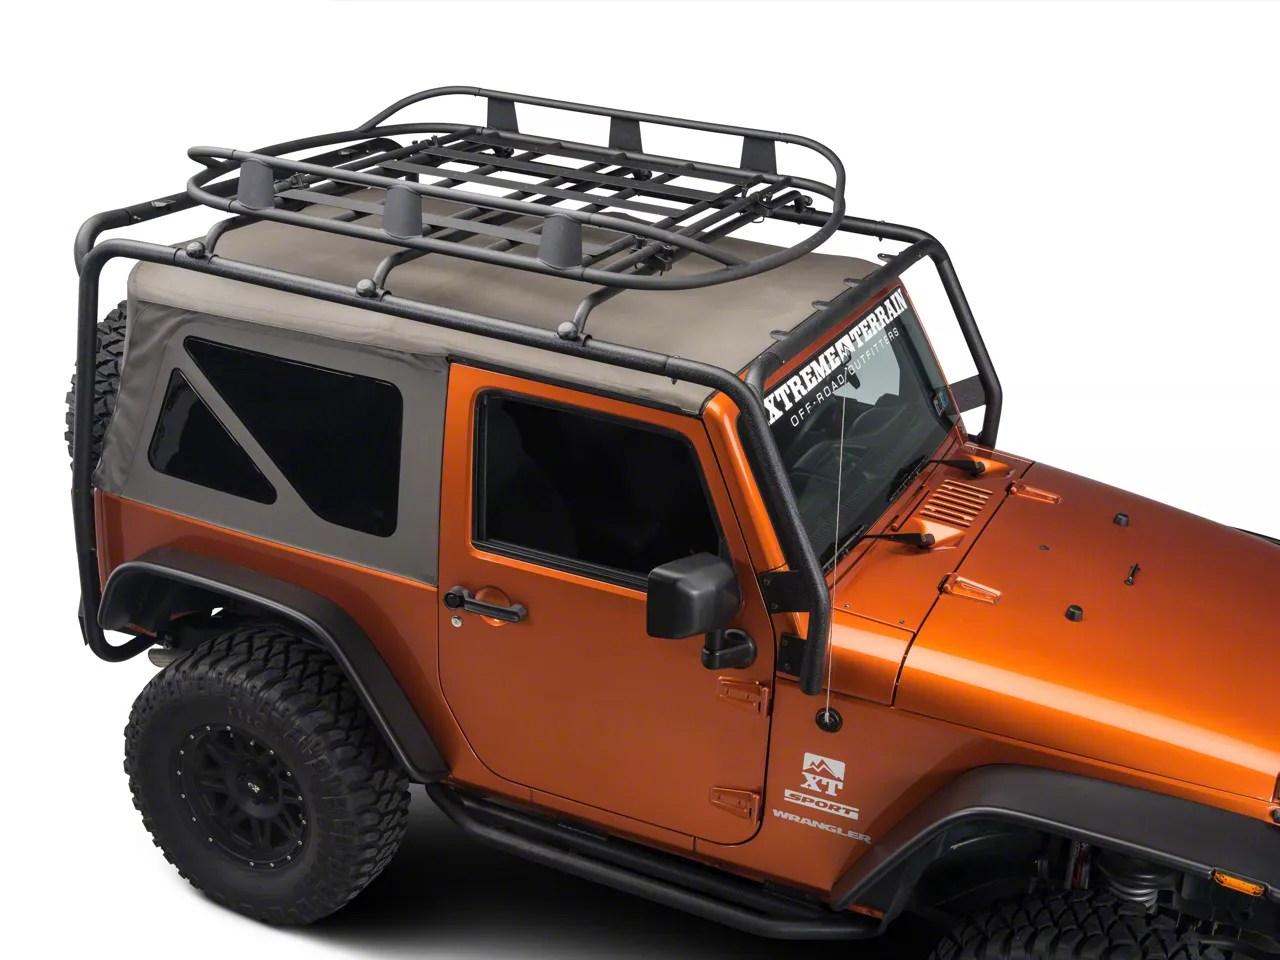 barricade roof rack basket textured black 66 21 jeep cj5 cj7 wrangler yj tj jk jl